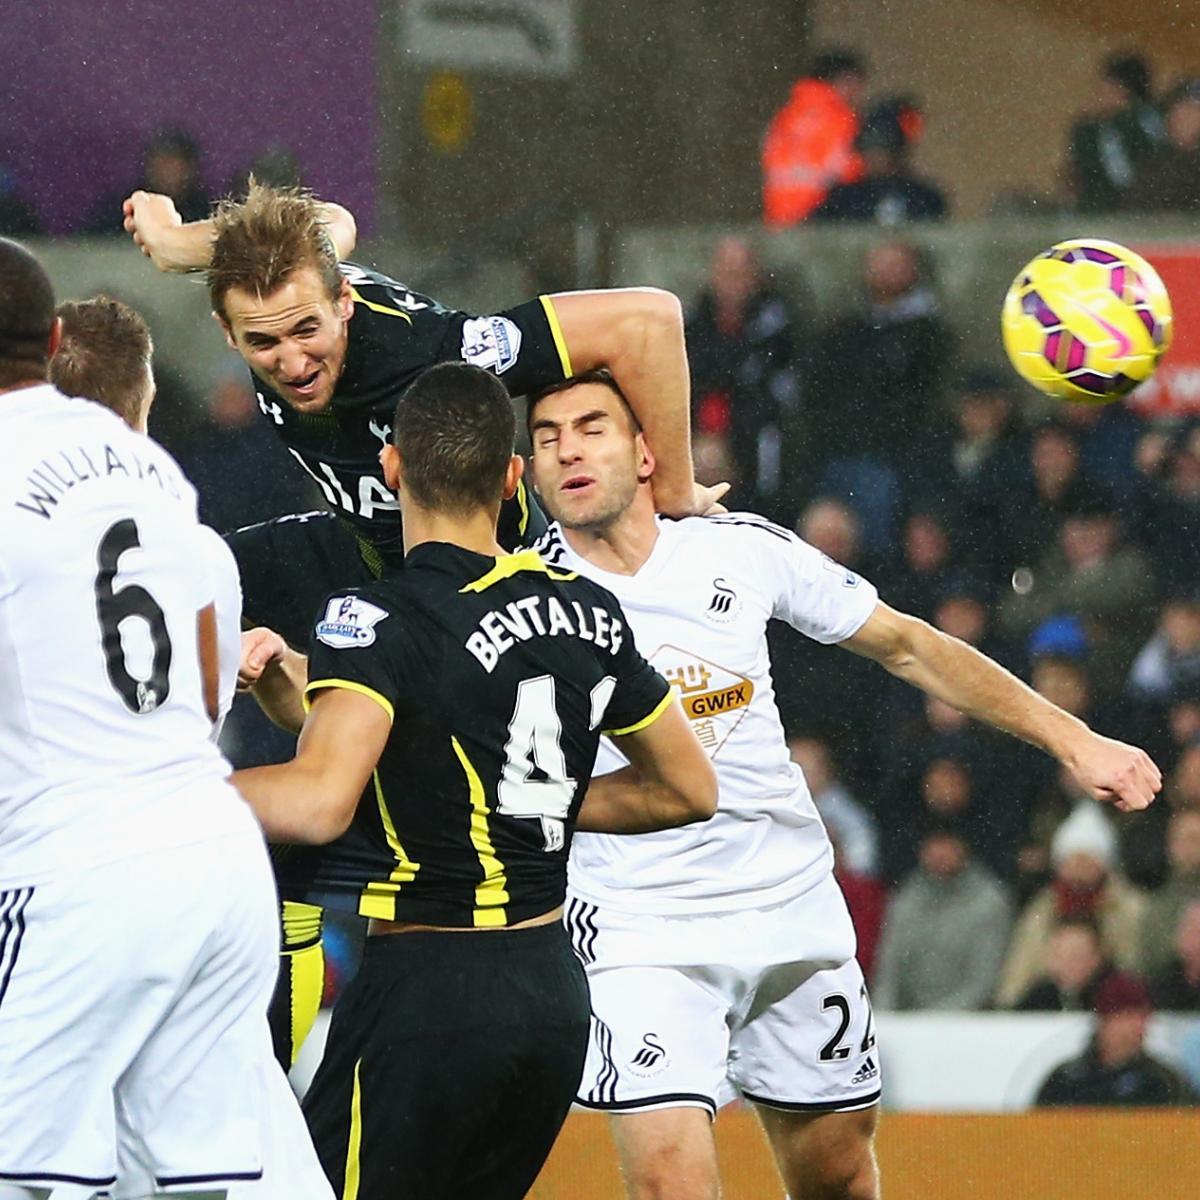 Tottenham 3 Fulham 1 Match Highlights Harry Kane Scores: Swansea Vs. Tottenham: Goals And Highlights From Premier